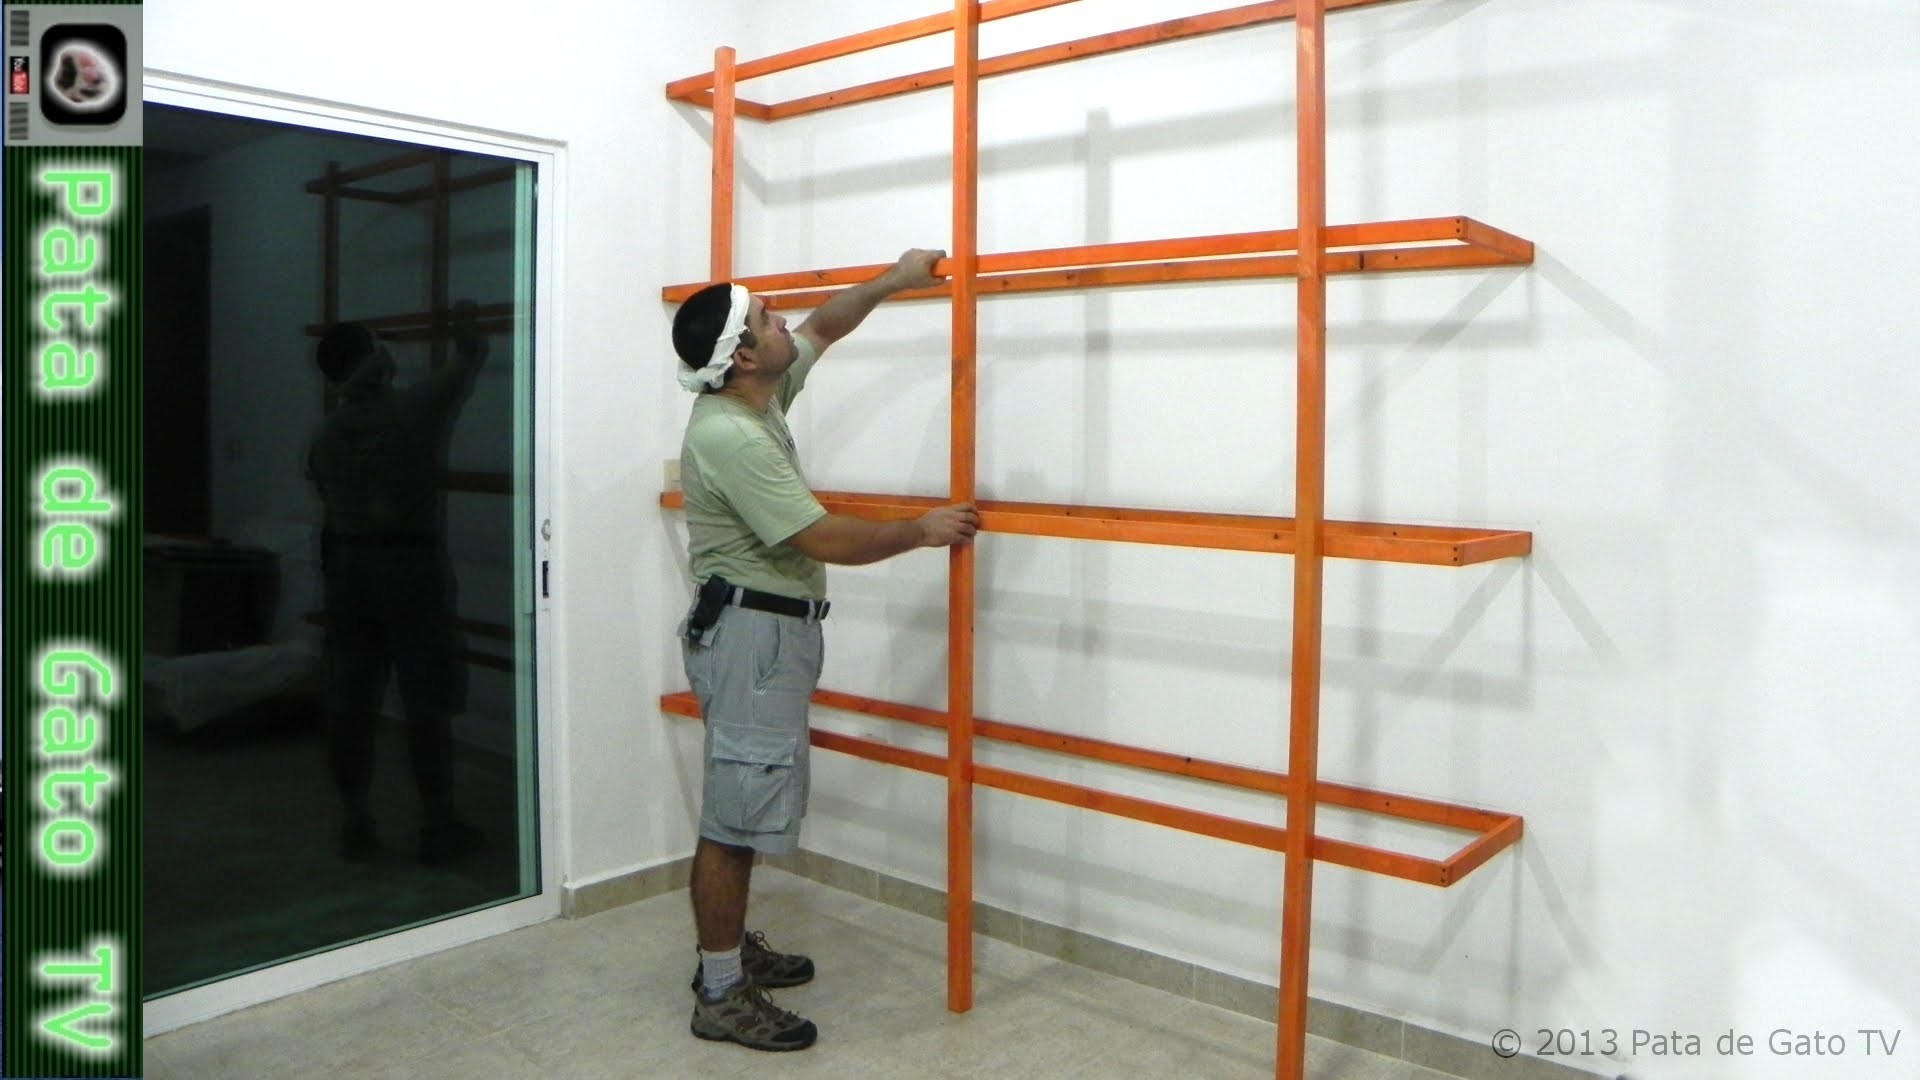 Estructura ligera para librero de piso y pared. Light structure for floor and wall bookshelf